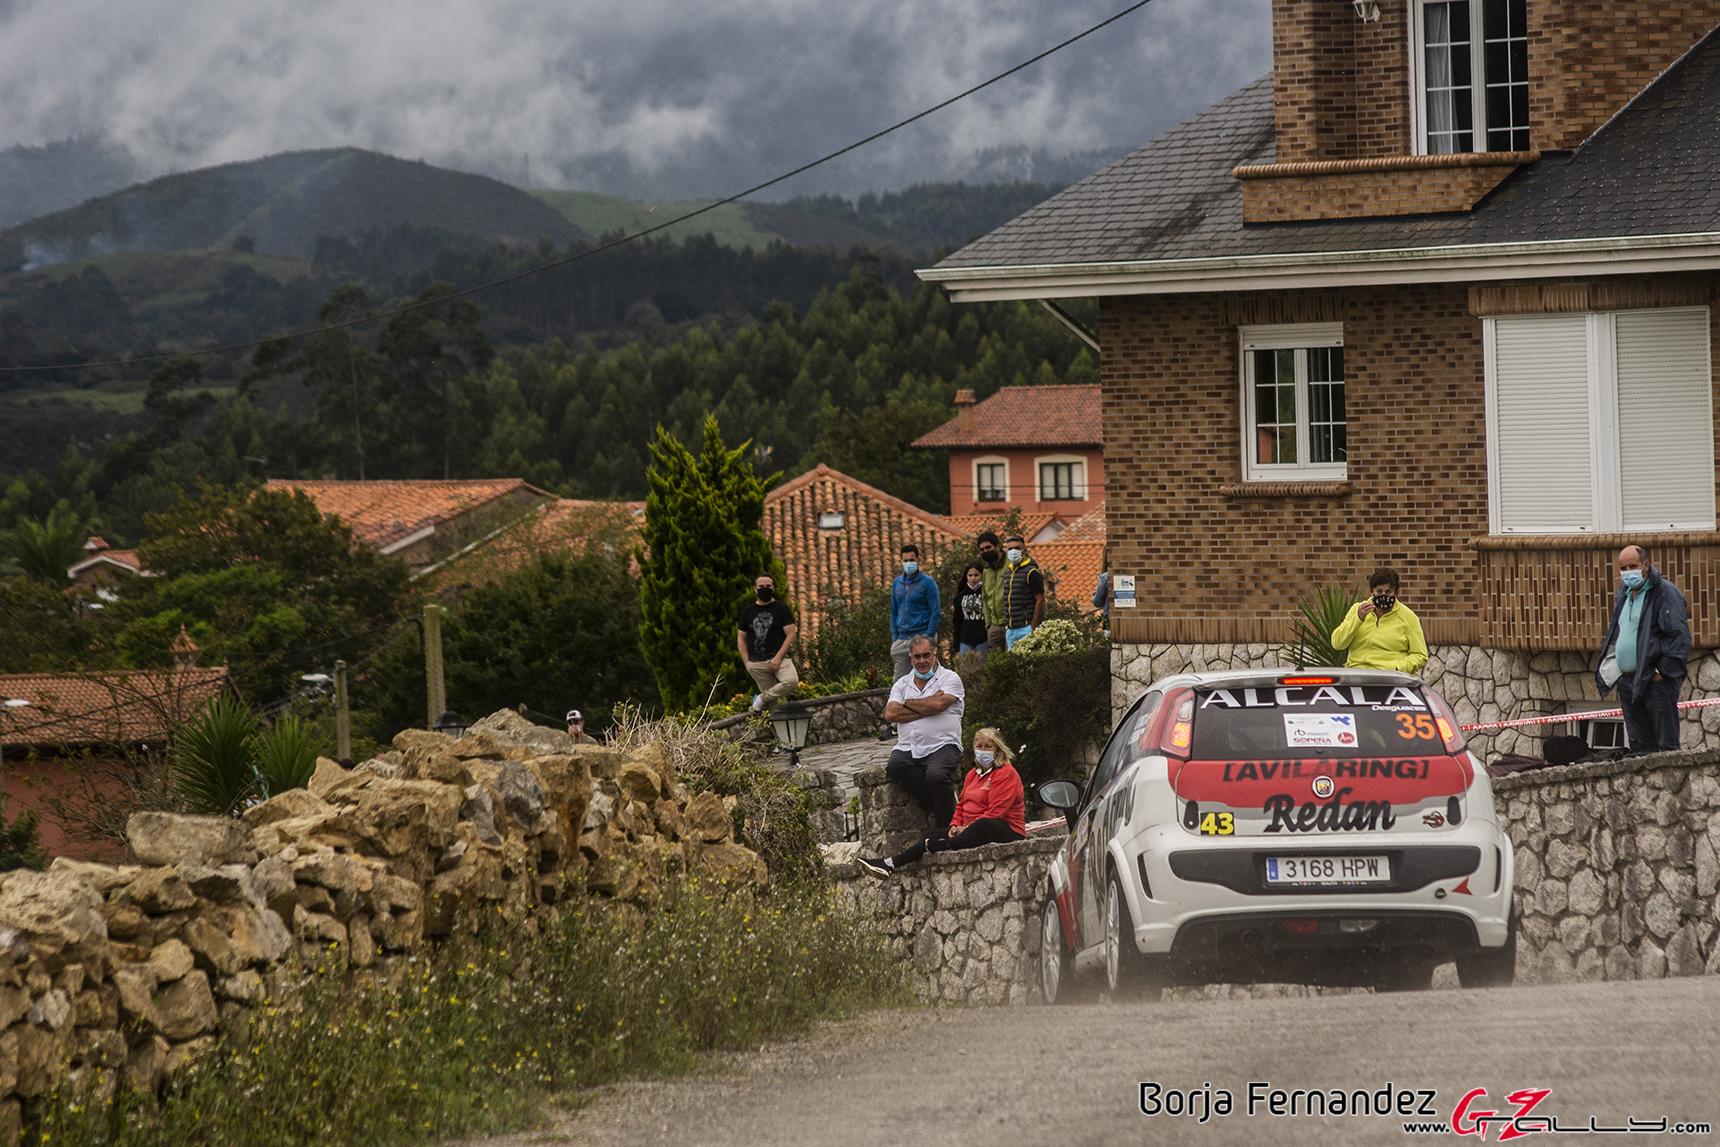 Rallysprint de Rudaguera 2020 - Borja Fernandez